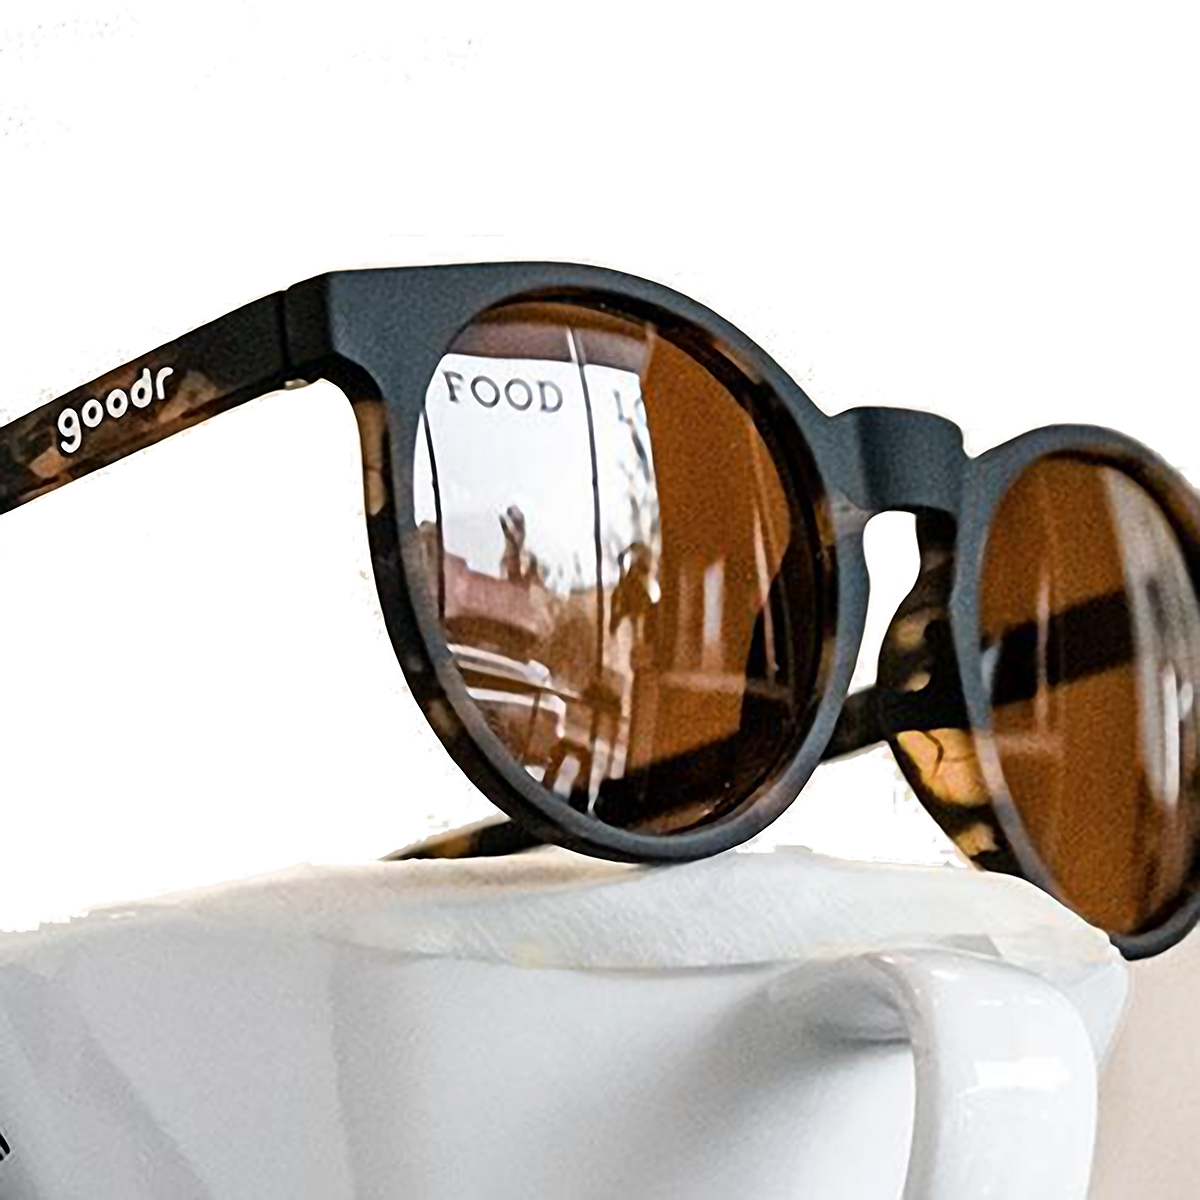 Goodr Nine Dollar Pour Over Sunglasses - Color: Tortoise - Size: OS, Tortoise, large, image 3